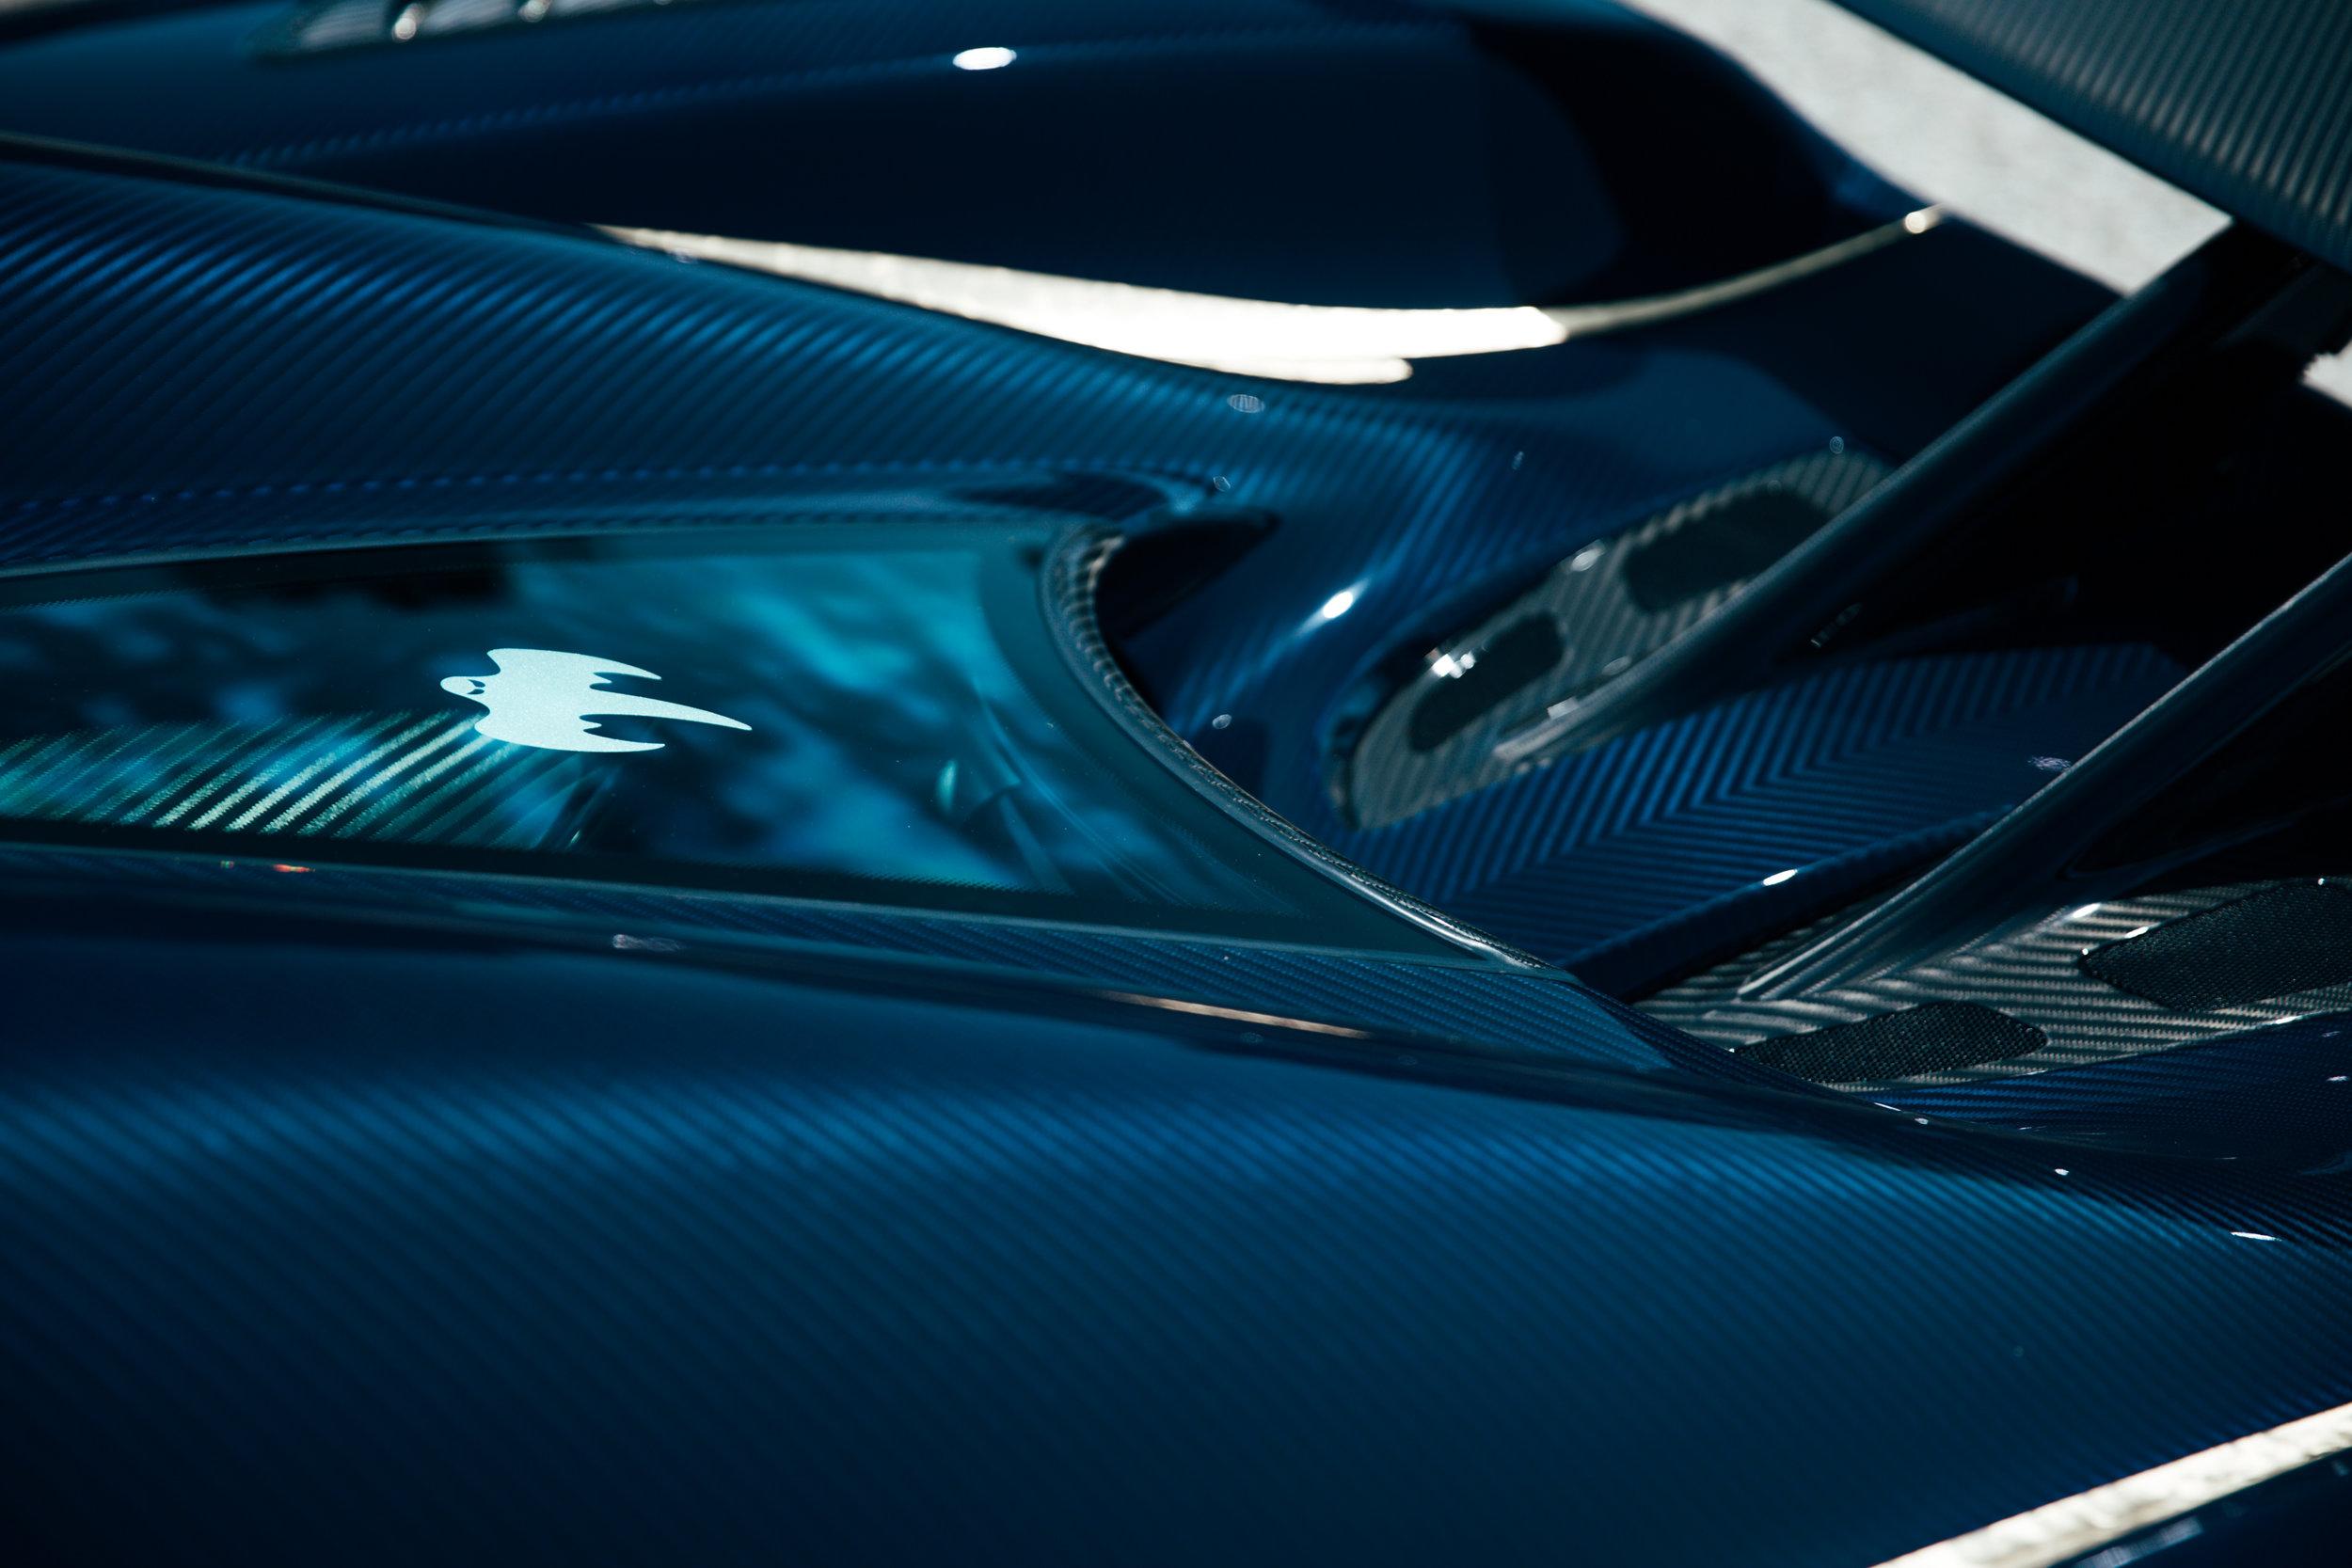 Stay_Driven_Monterey_Car_Week_Koenigsegg-74.jpg